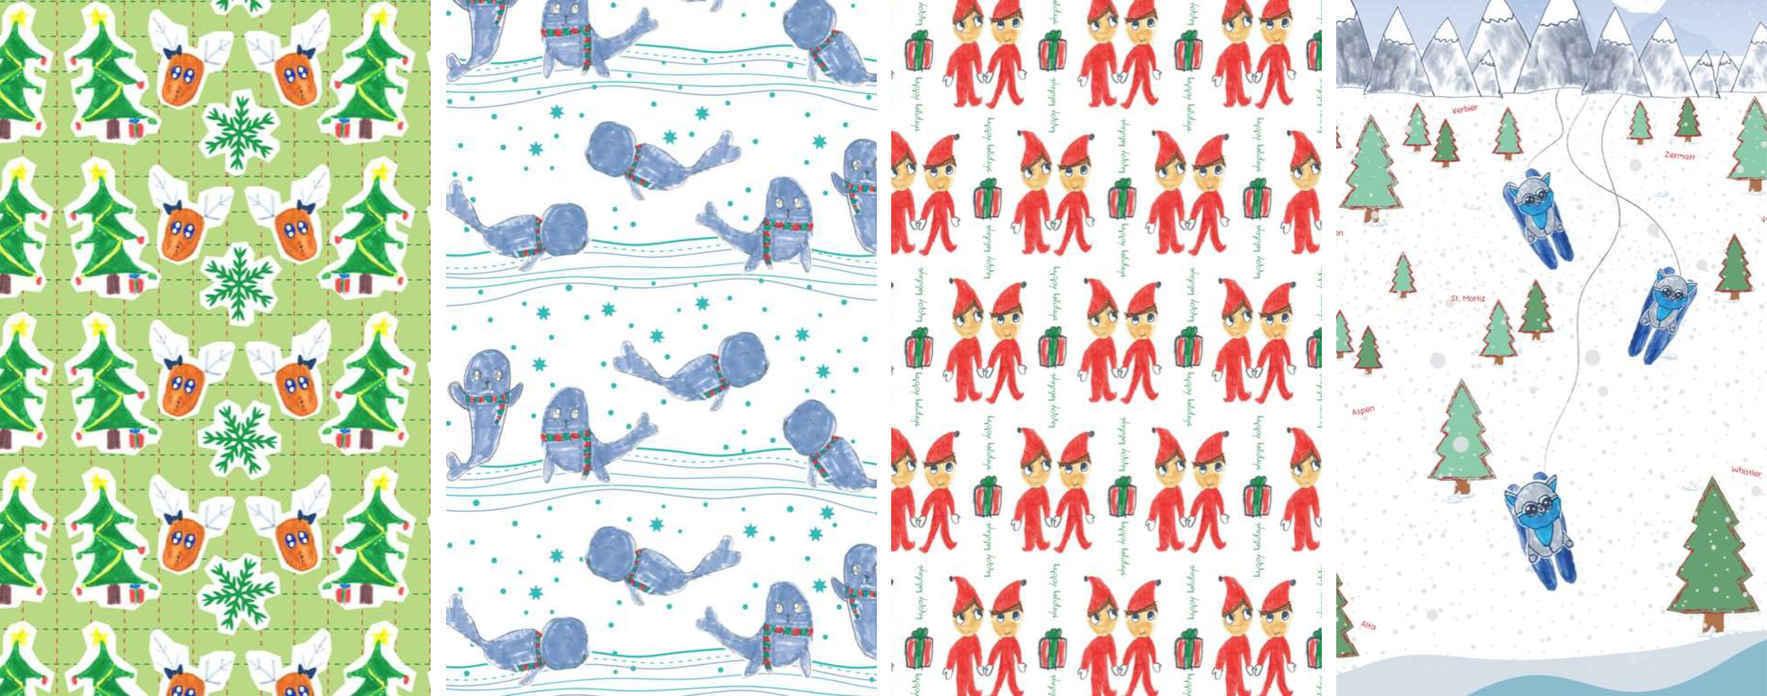 Wrap Back Holiday Cheer image